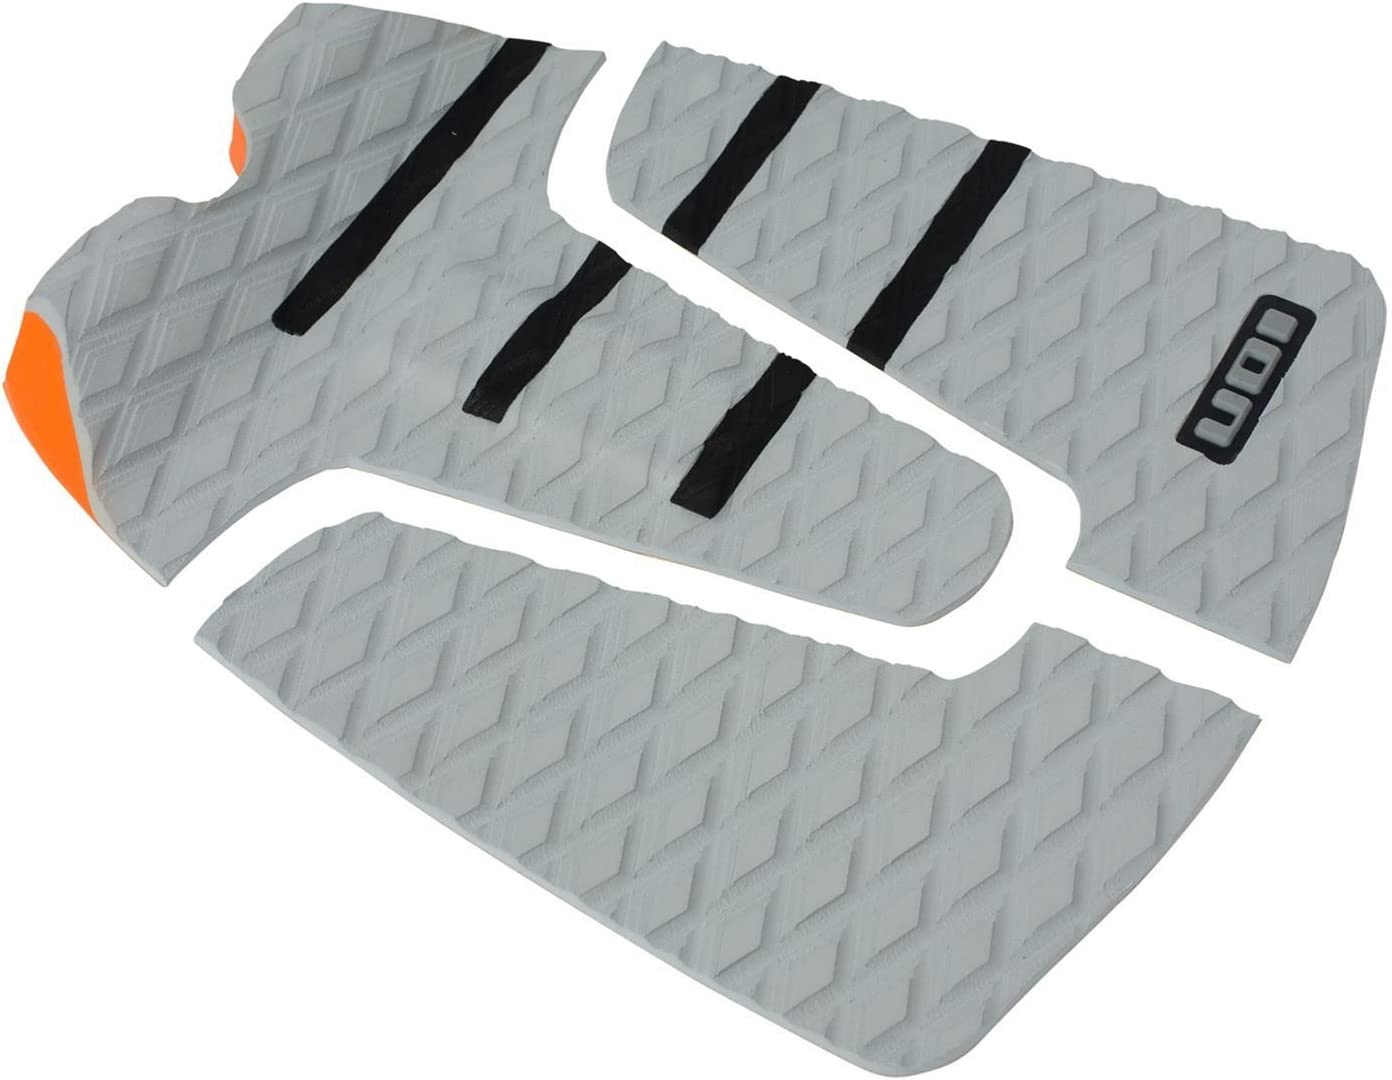 ION Footpad Deck Grip Pad 3-tlg Grau/Schwarz Surfboard Wellenreiter